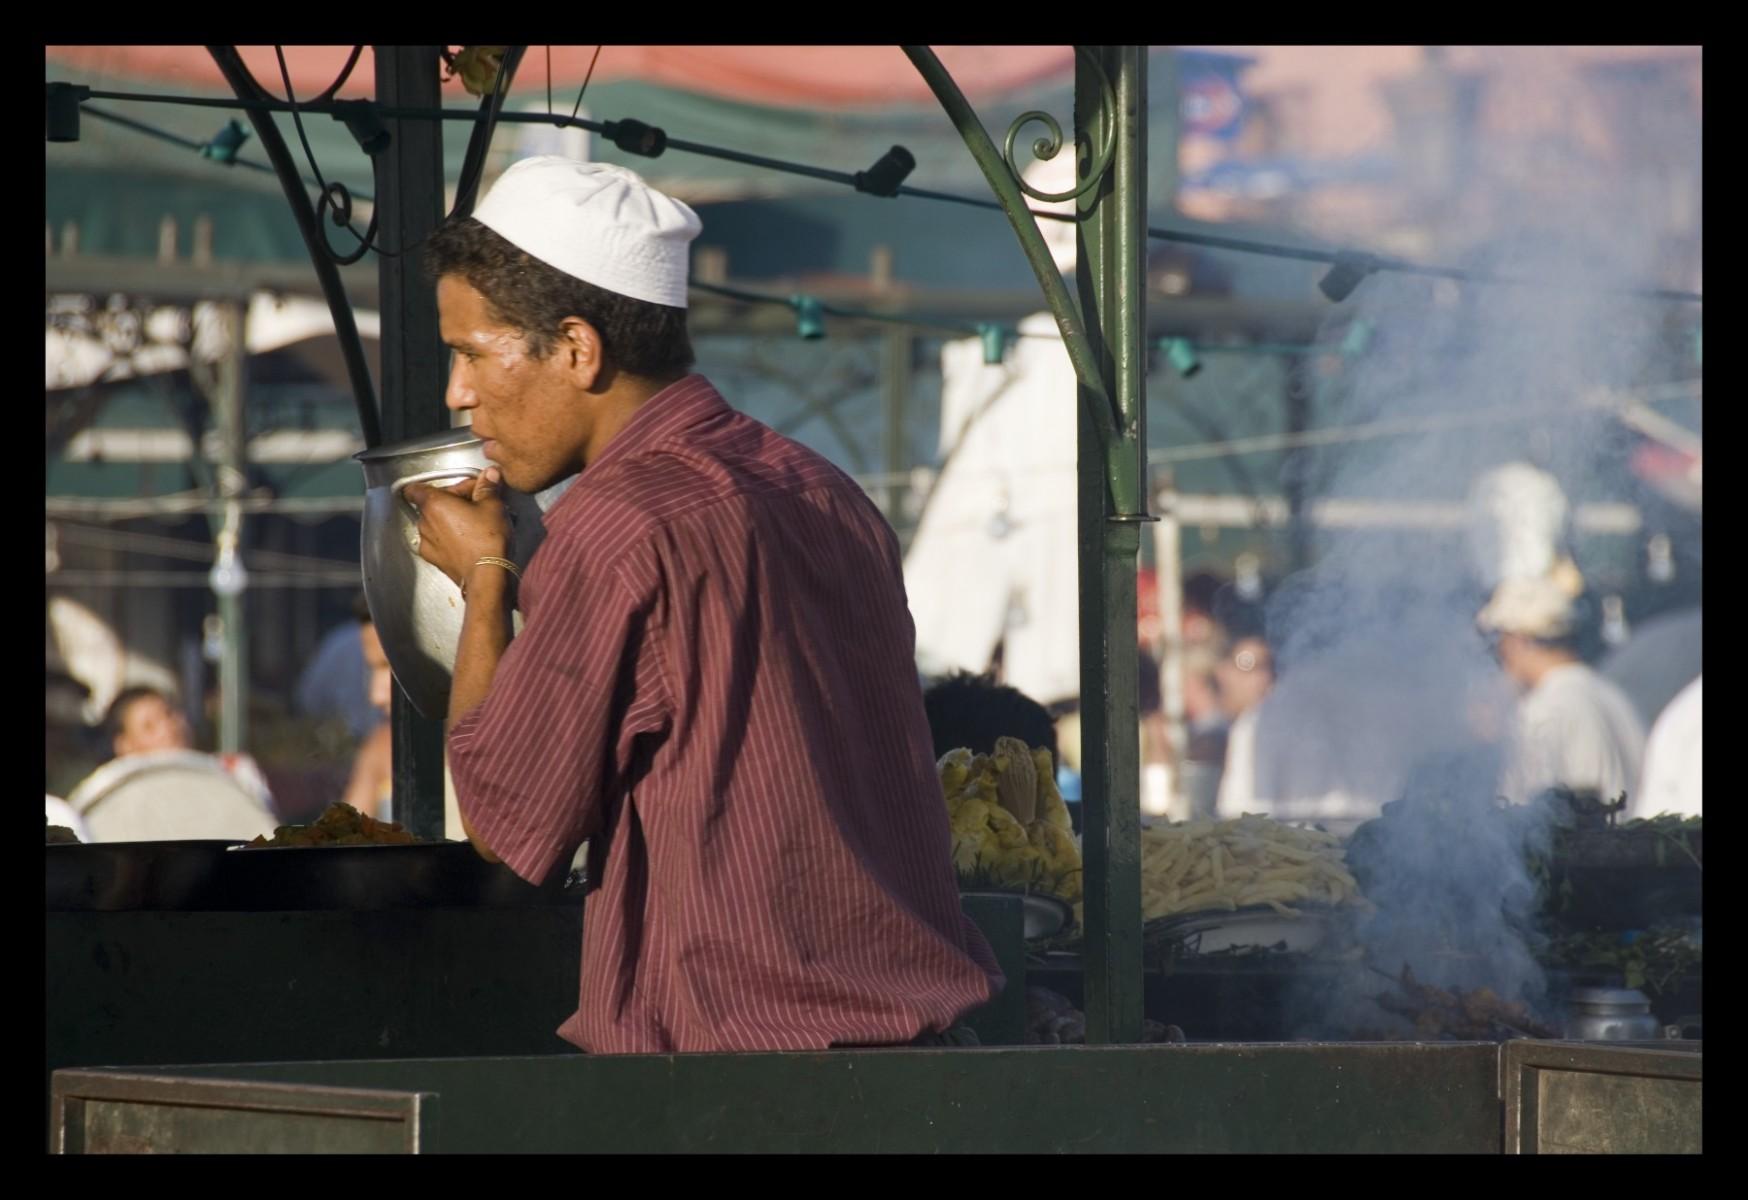 88614_DSC0137 jamal el fna food vendor